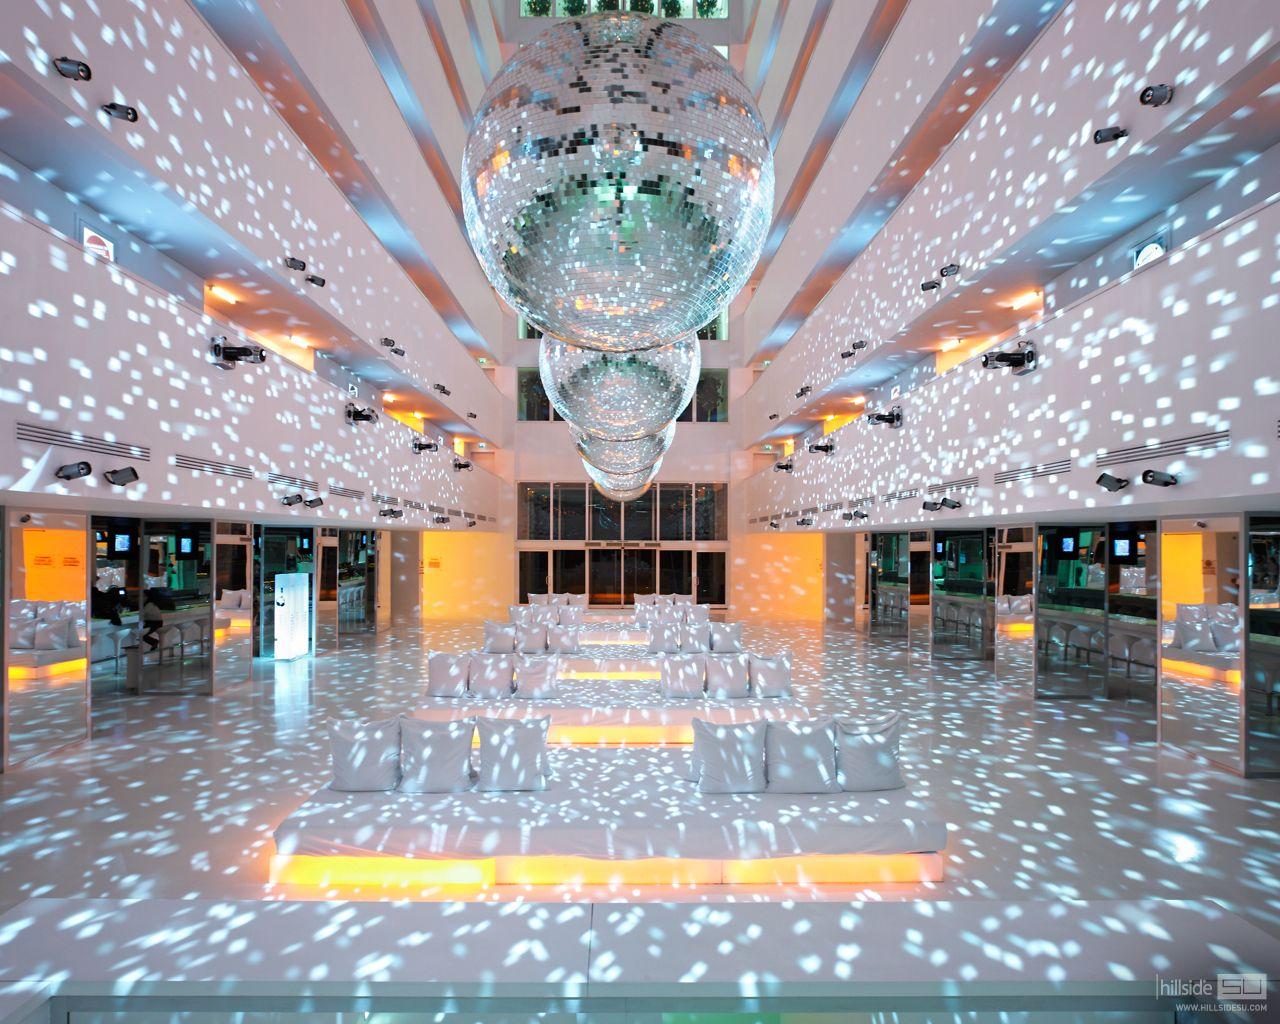 Hillside Su Hotel Antalya Hotel Boutique Hotels Interiors